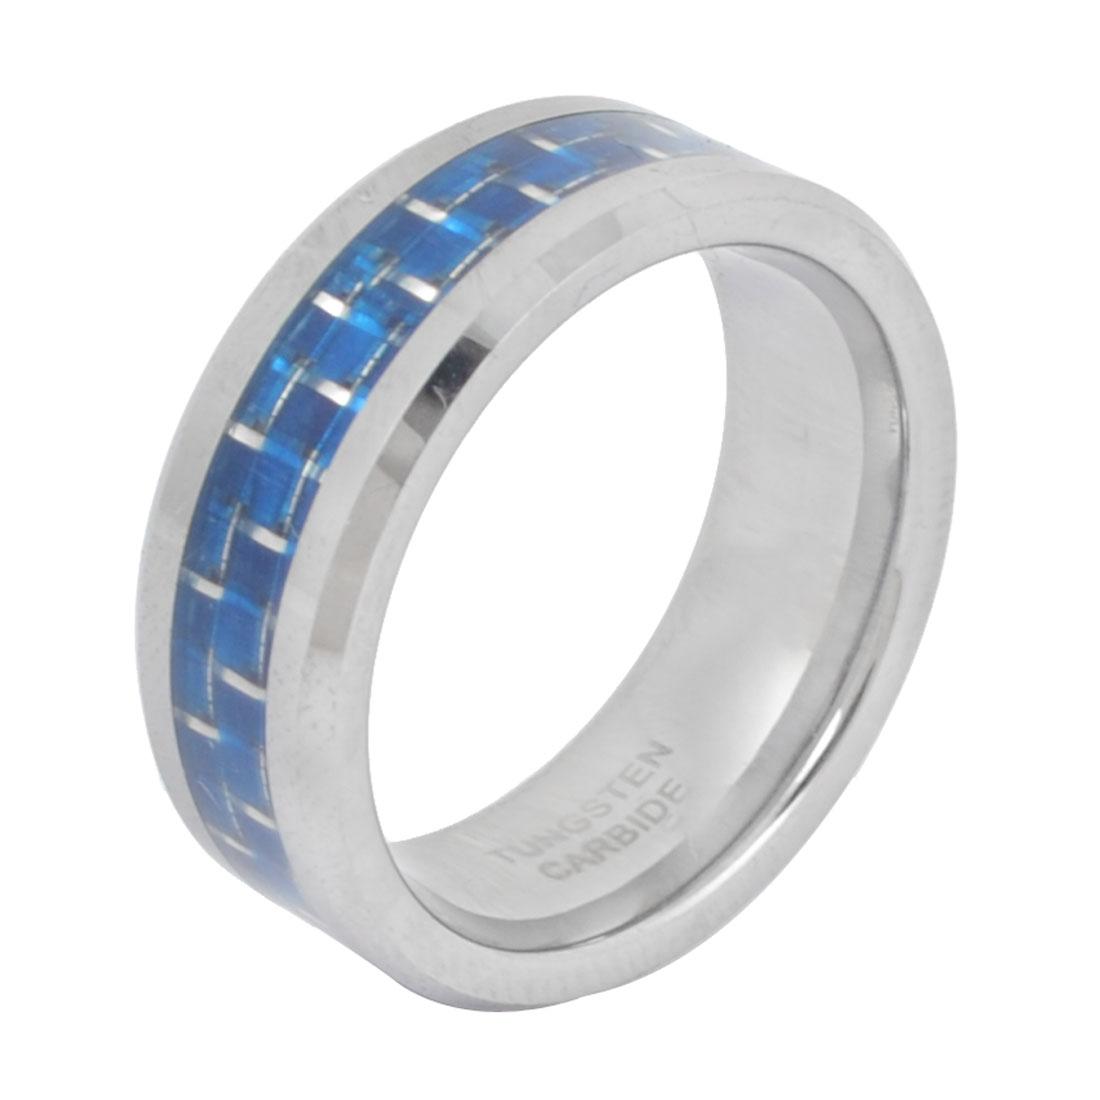 Man Finger Ornament Inside Carbon Fiber Print Ring Silver Tone Blue US 6 1/2